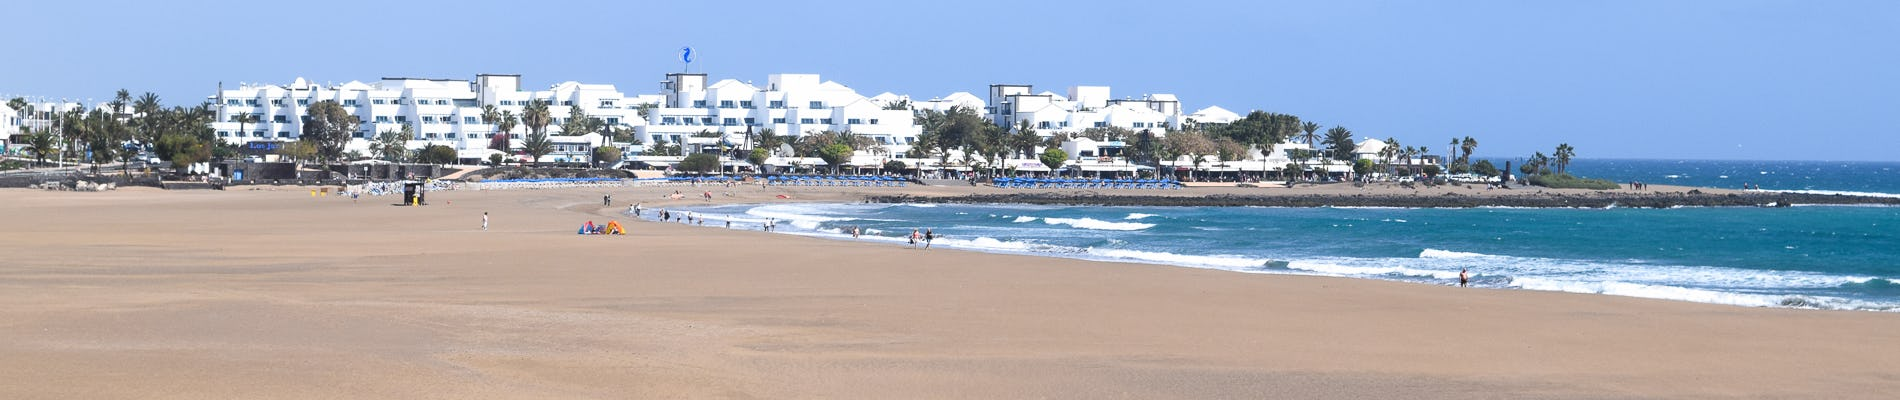 Afbeeldingsresultaat voor playa de los pocillos